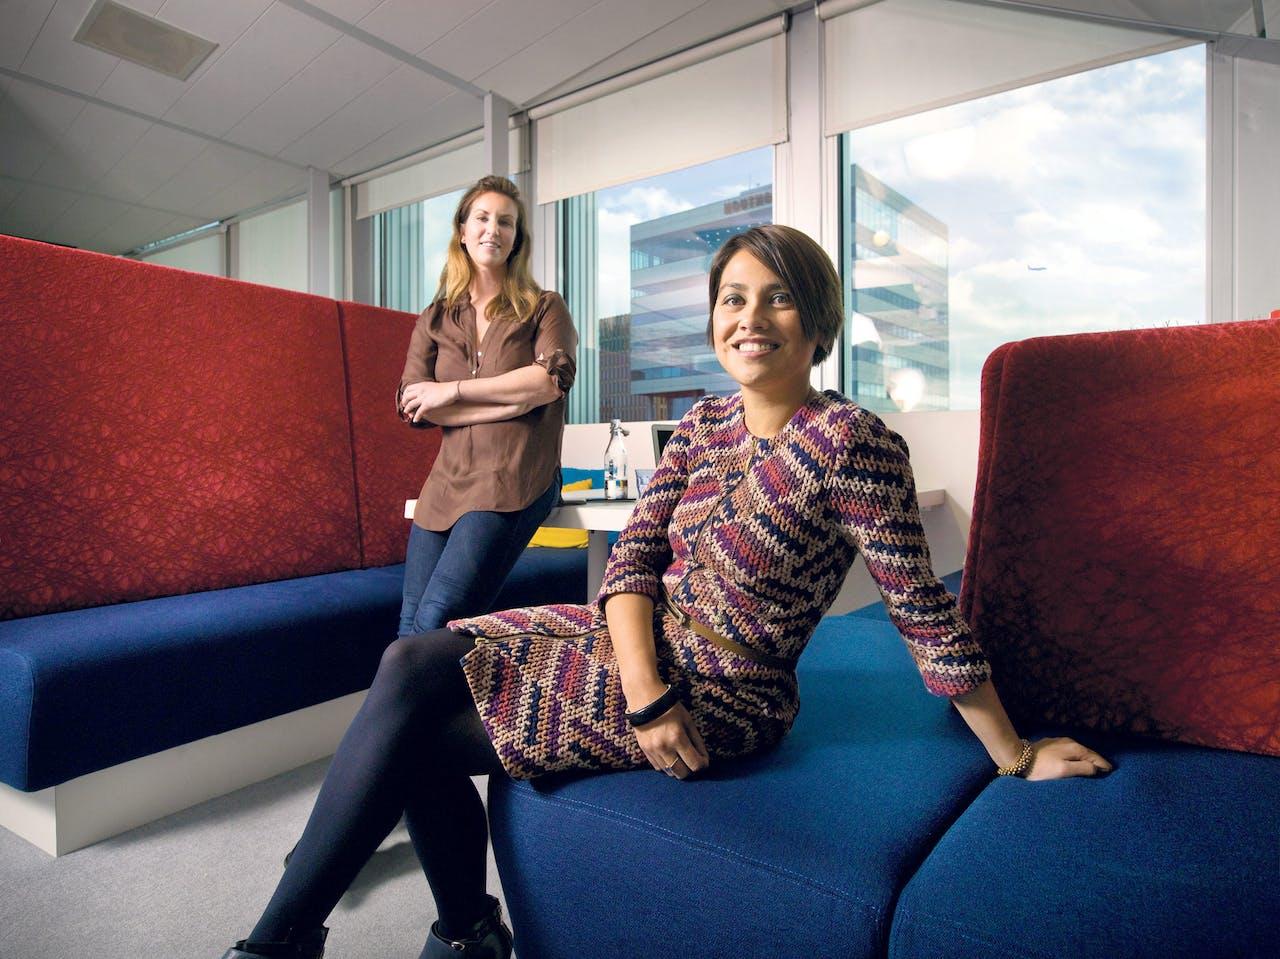 Meghan Casserly (l.) en Daphne Laan van Google Nederland.foto: (Kato Tan)